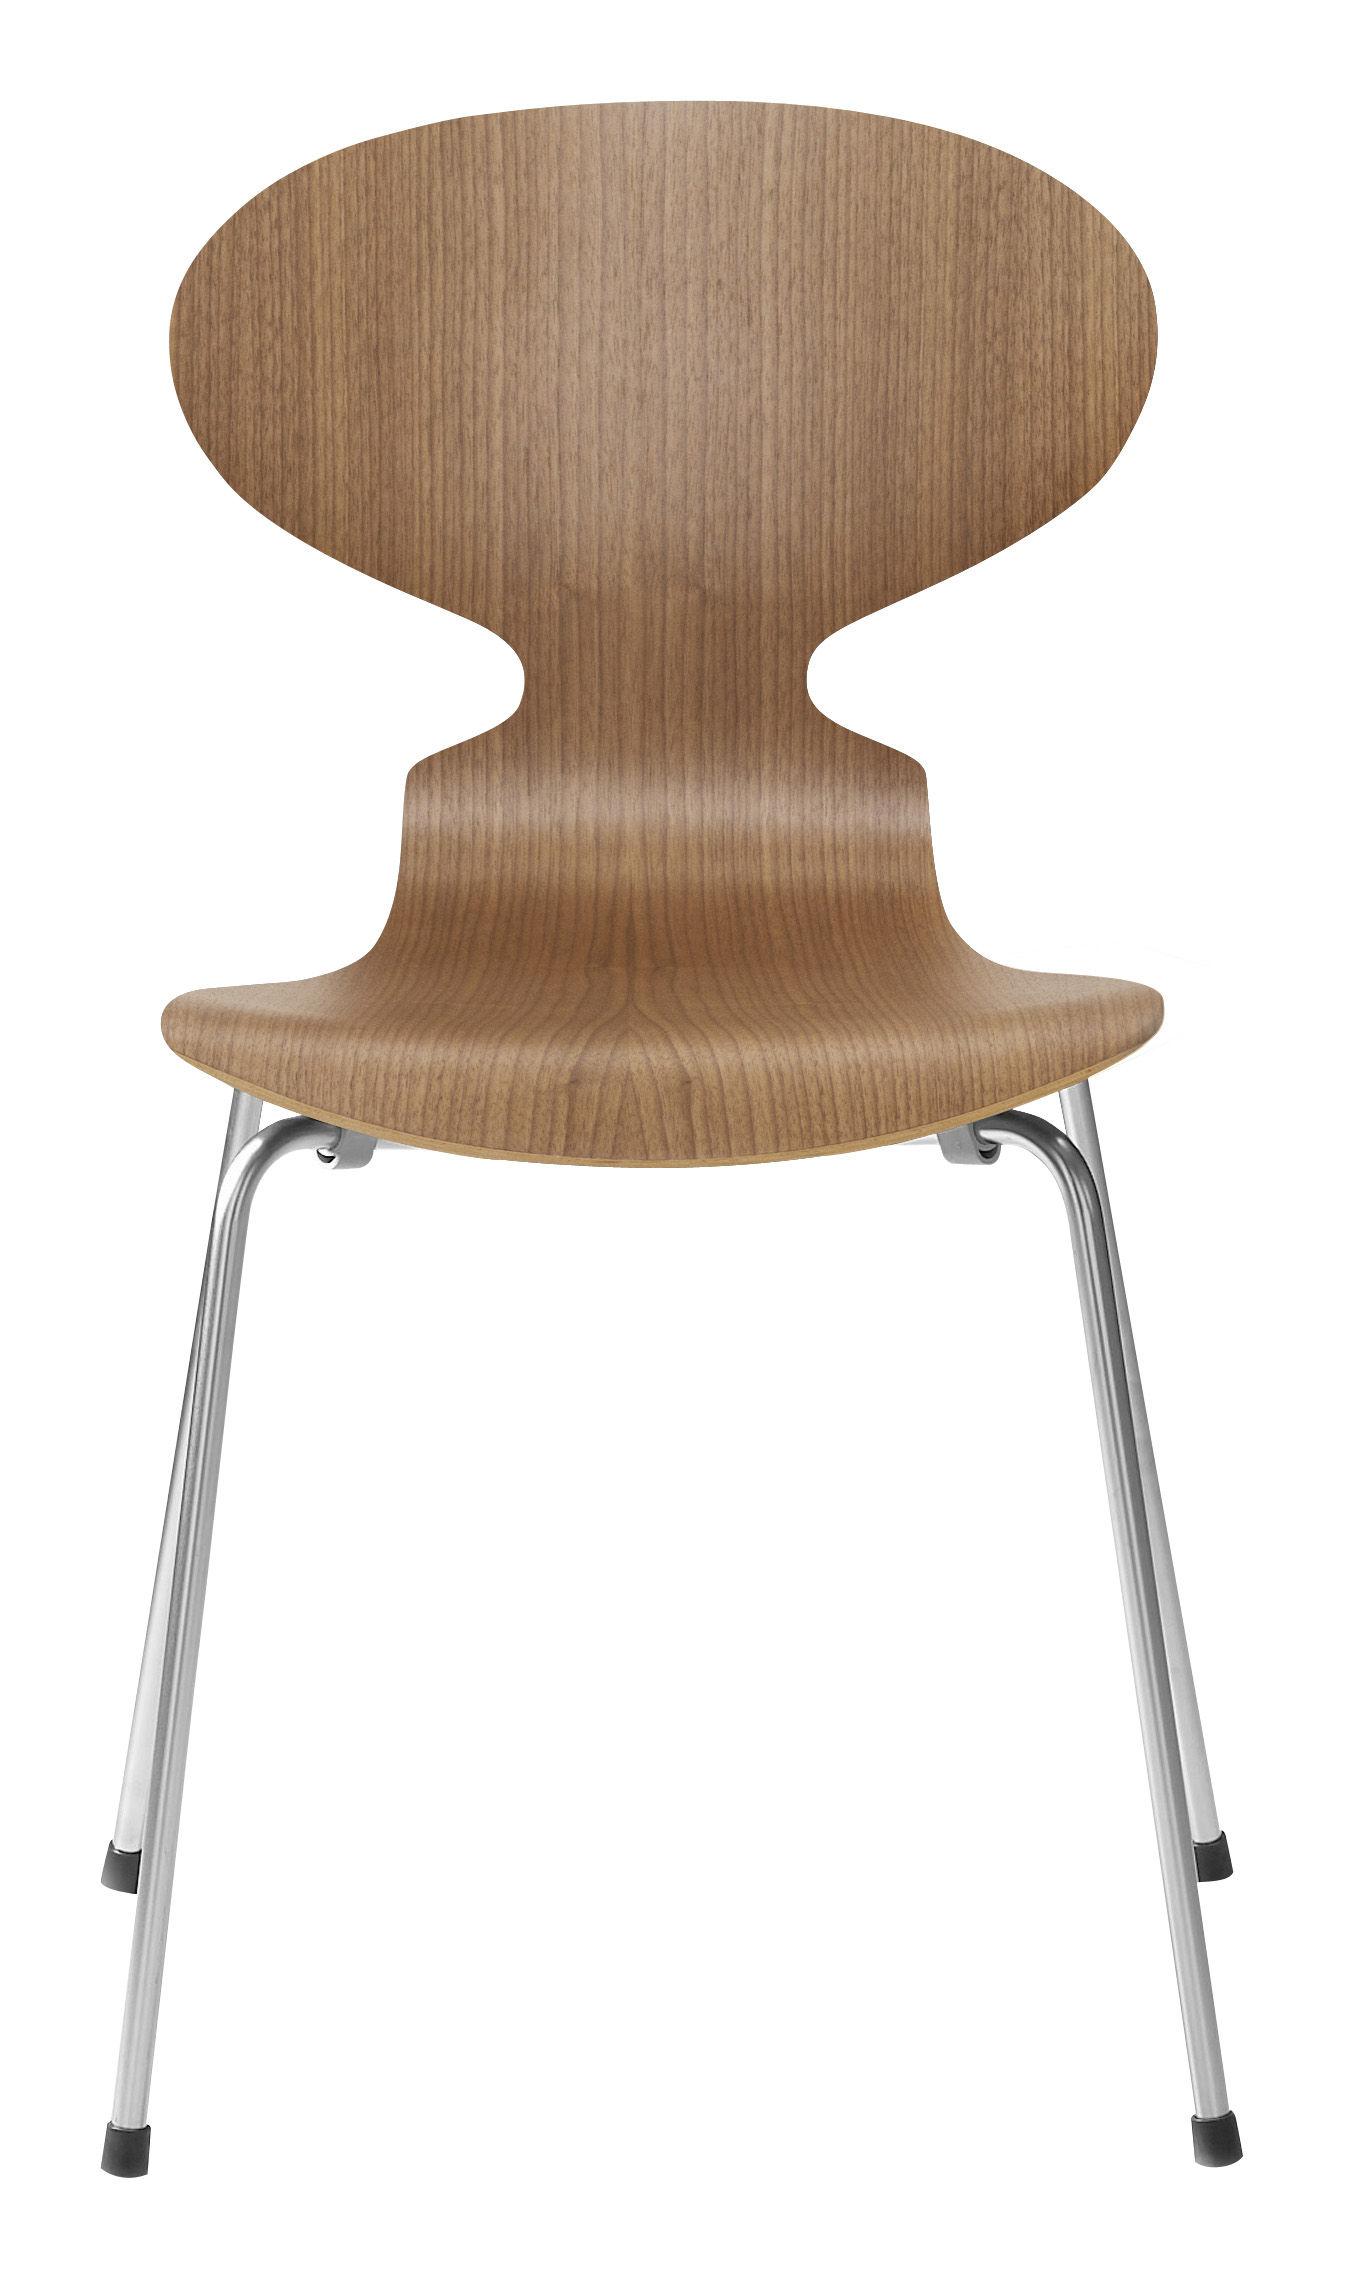 Chaise empilable fourmi bois naturel noyer fritz hansen for Chaise la fourmi